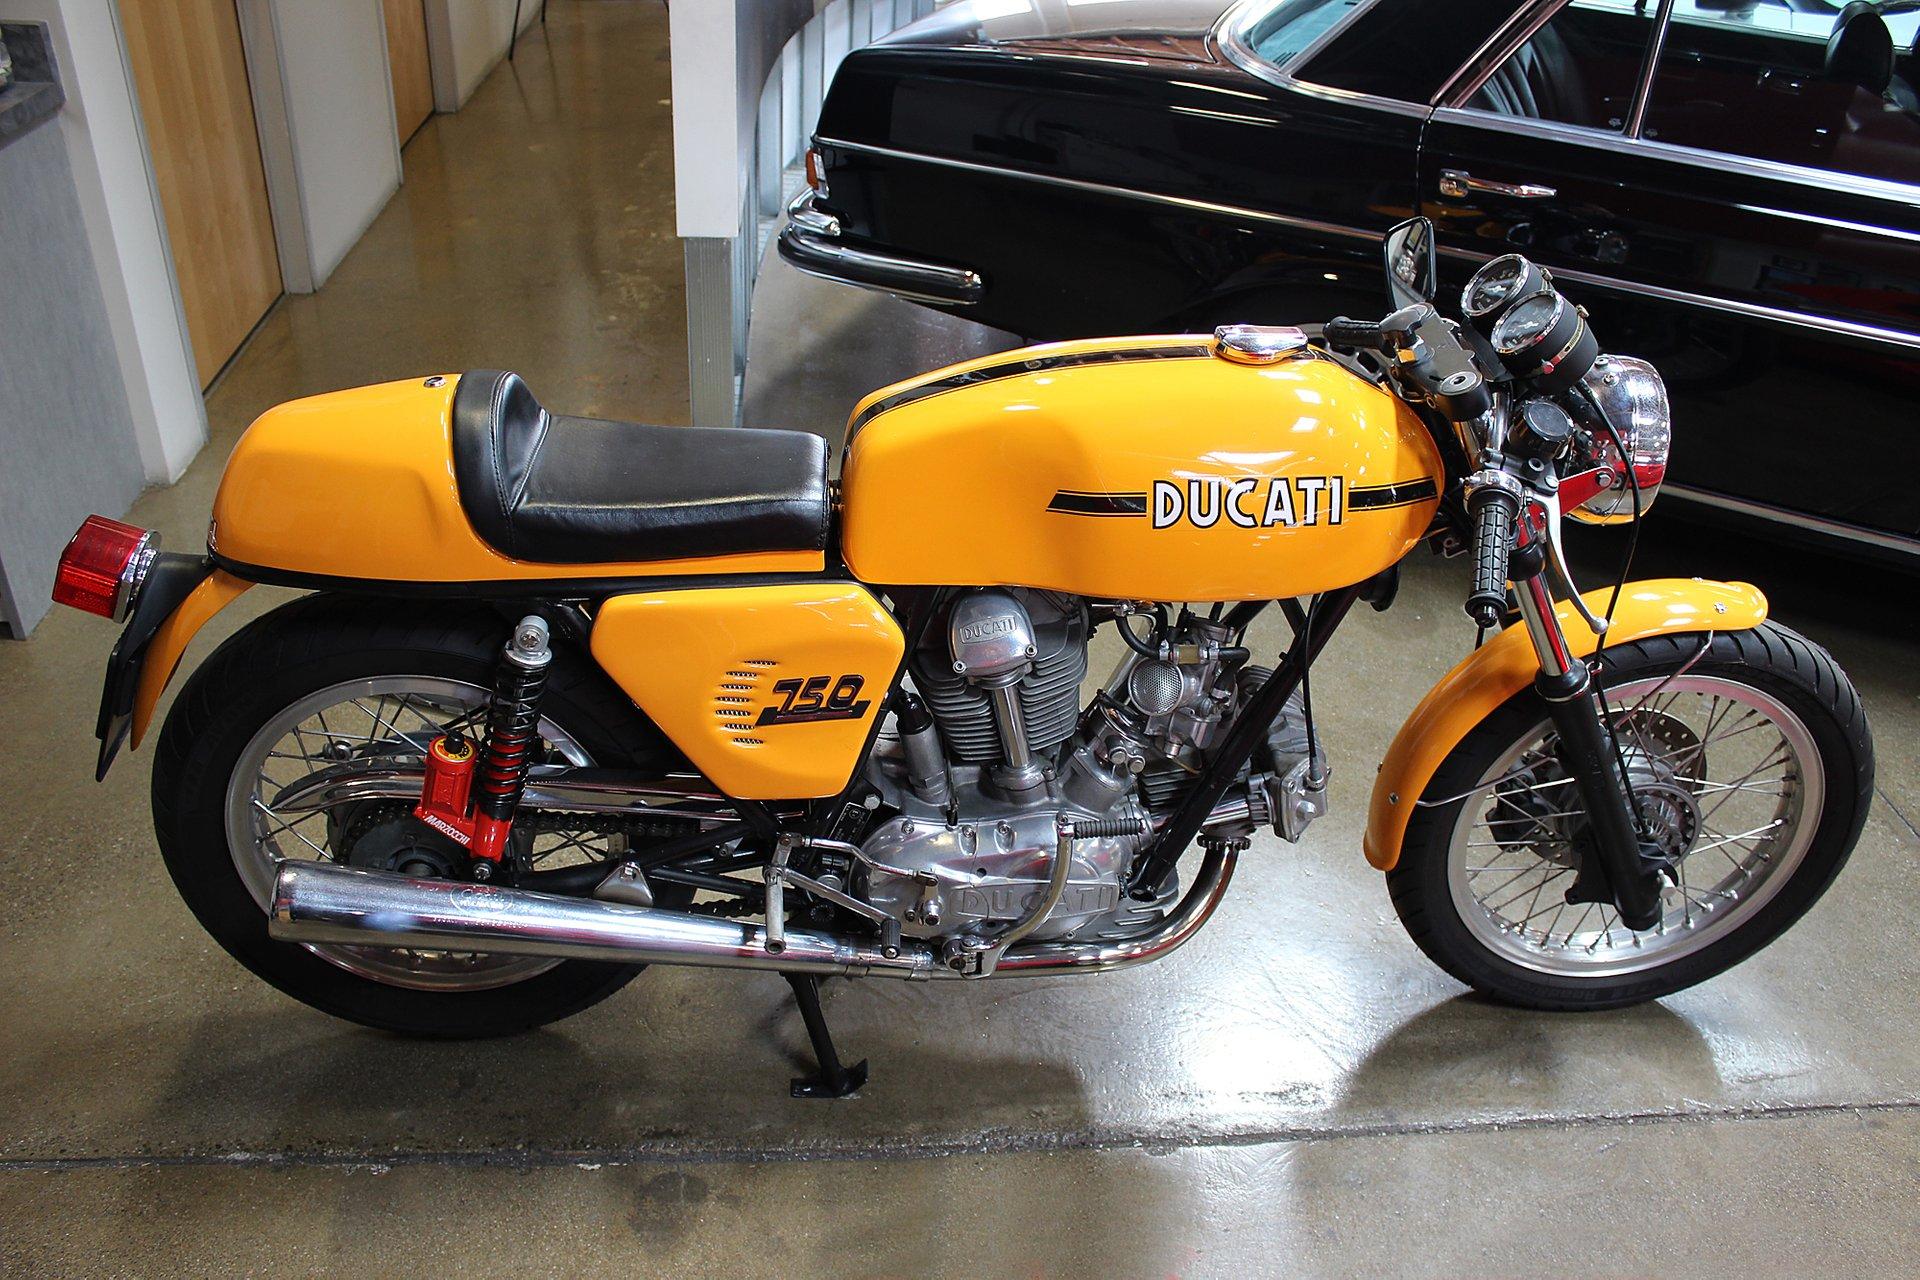 1974 ducati 750 sport